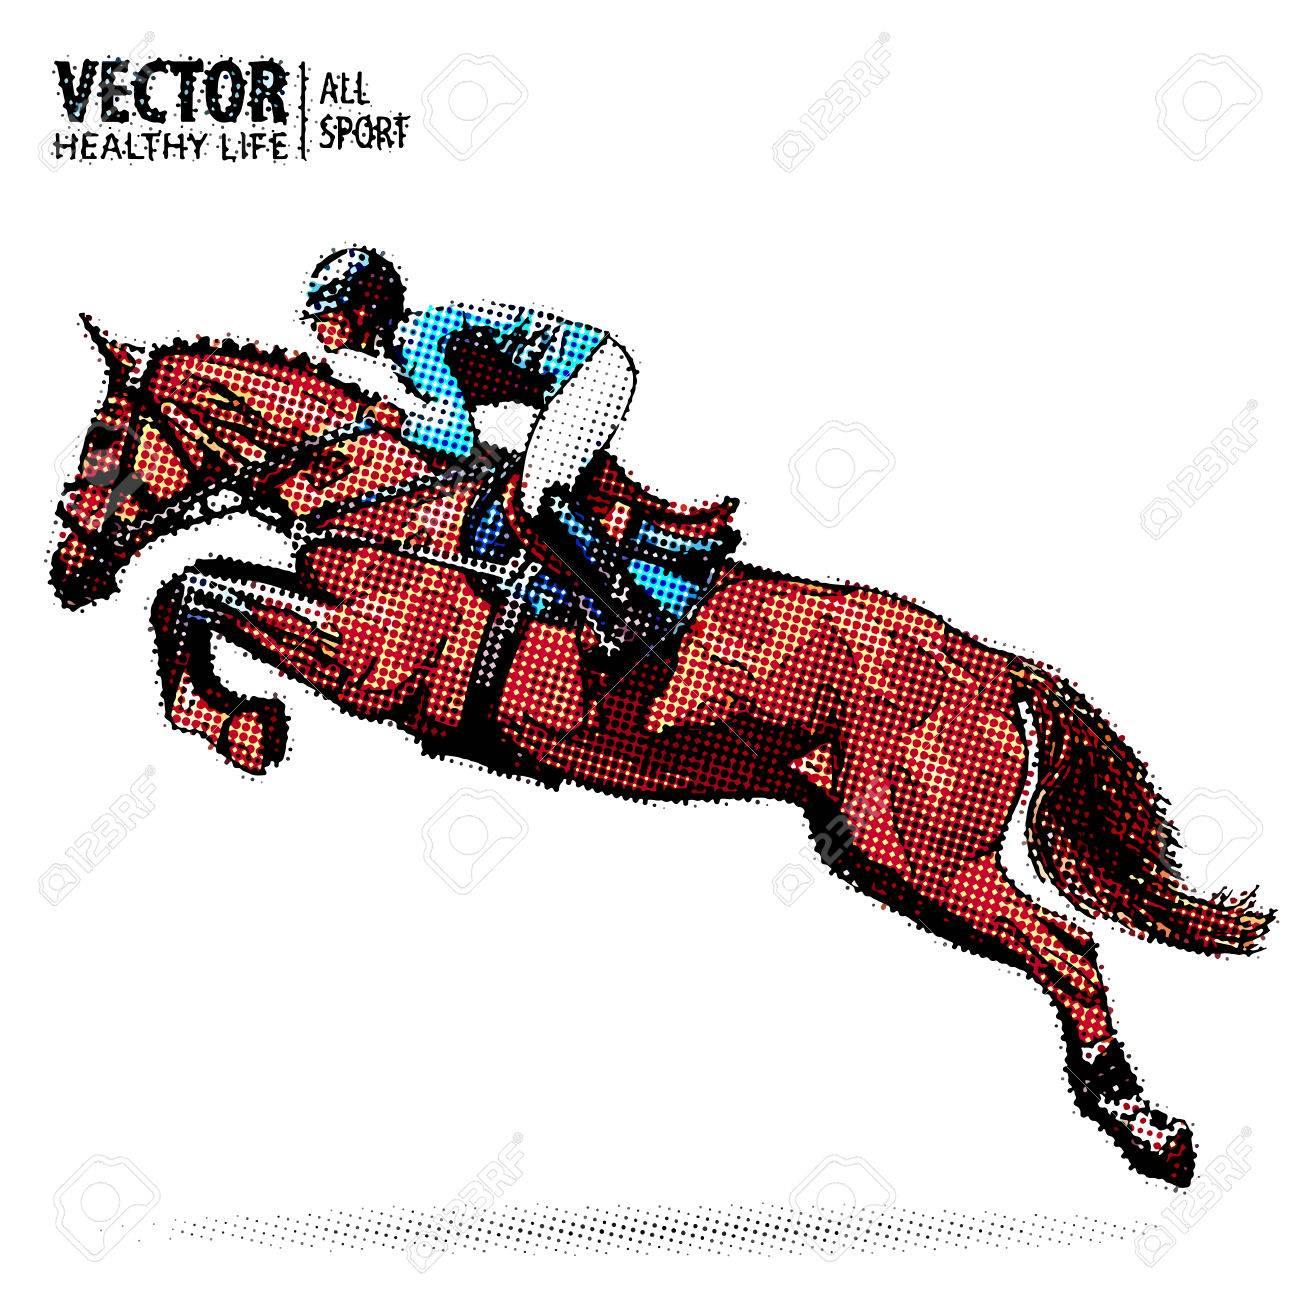 Jockey On Horse Champion Horse Riding Equestrian Sport Jockey Royalty Free Cliparts Vectors And Stock Illustration Image 80785498